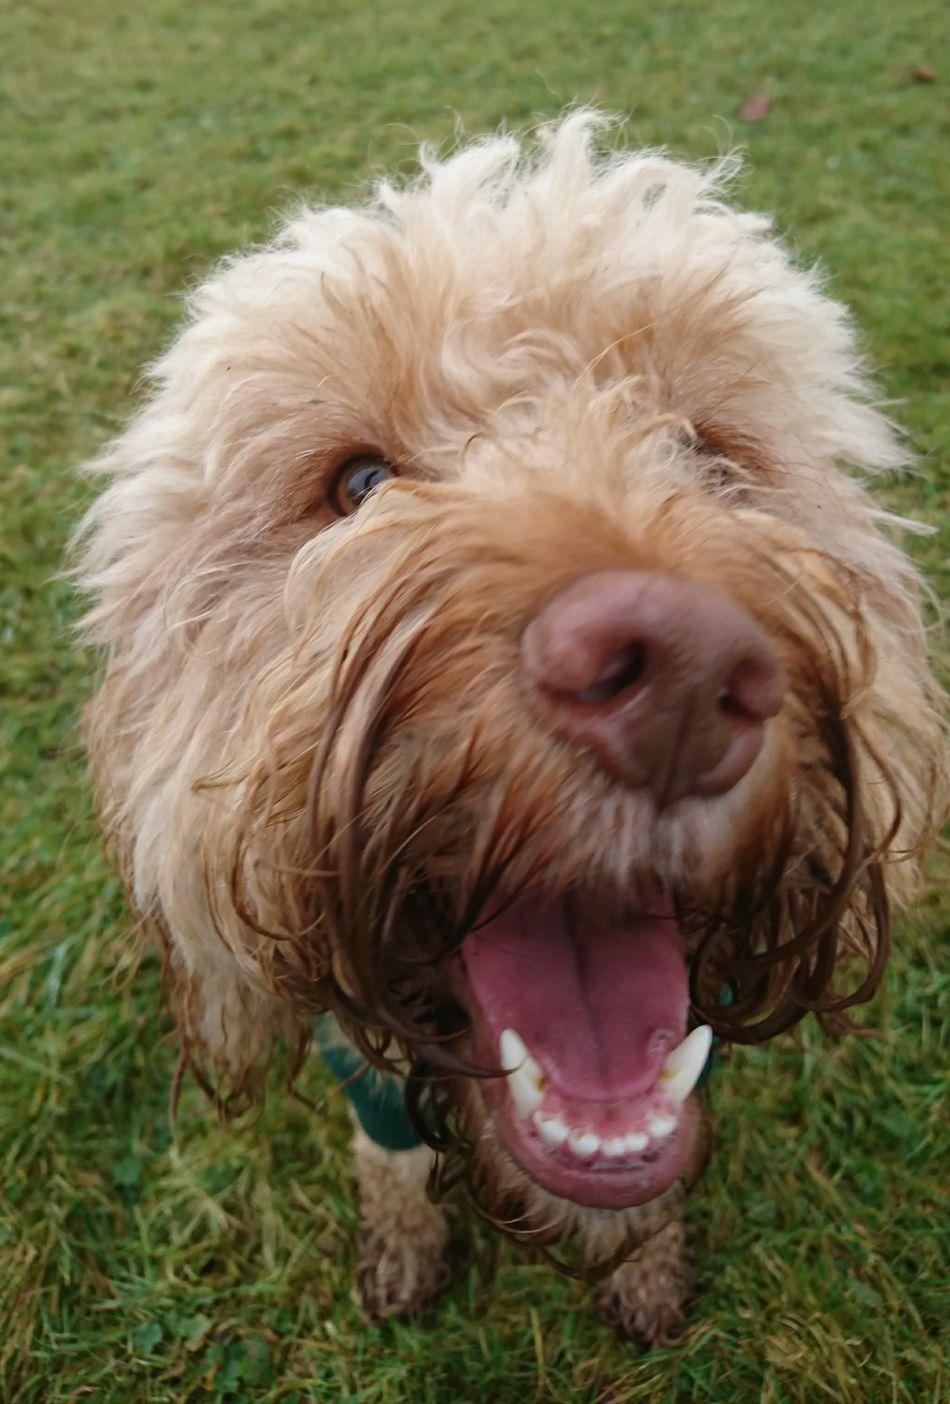 Cockerpoo Canine Love :) Canine Photography Dog❤ Dog Photography Dog Walking Doglovers Dogsareawesome Dogs_of_instagram Dogs Of EyeEm Dog Love DogLove Dogslife